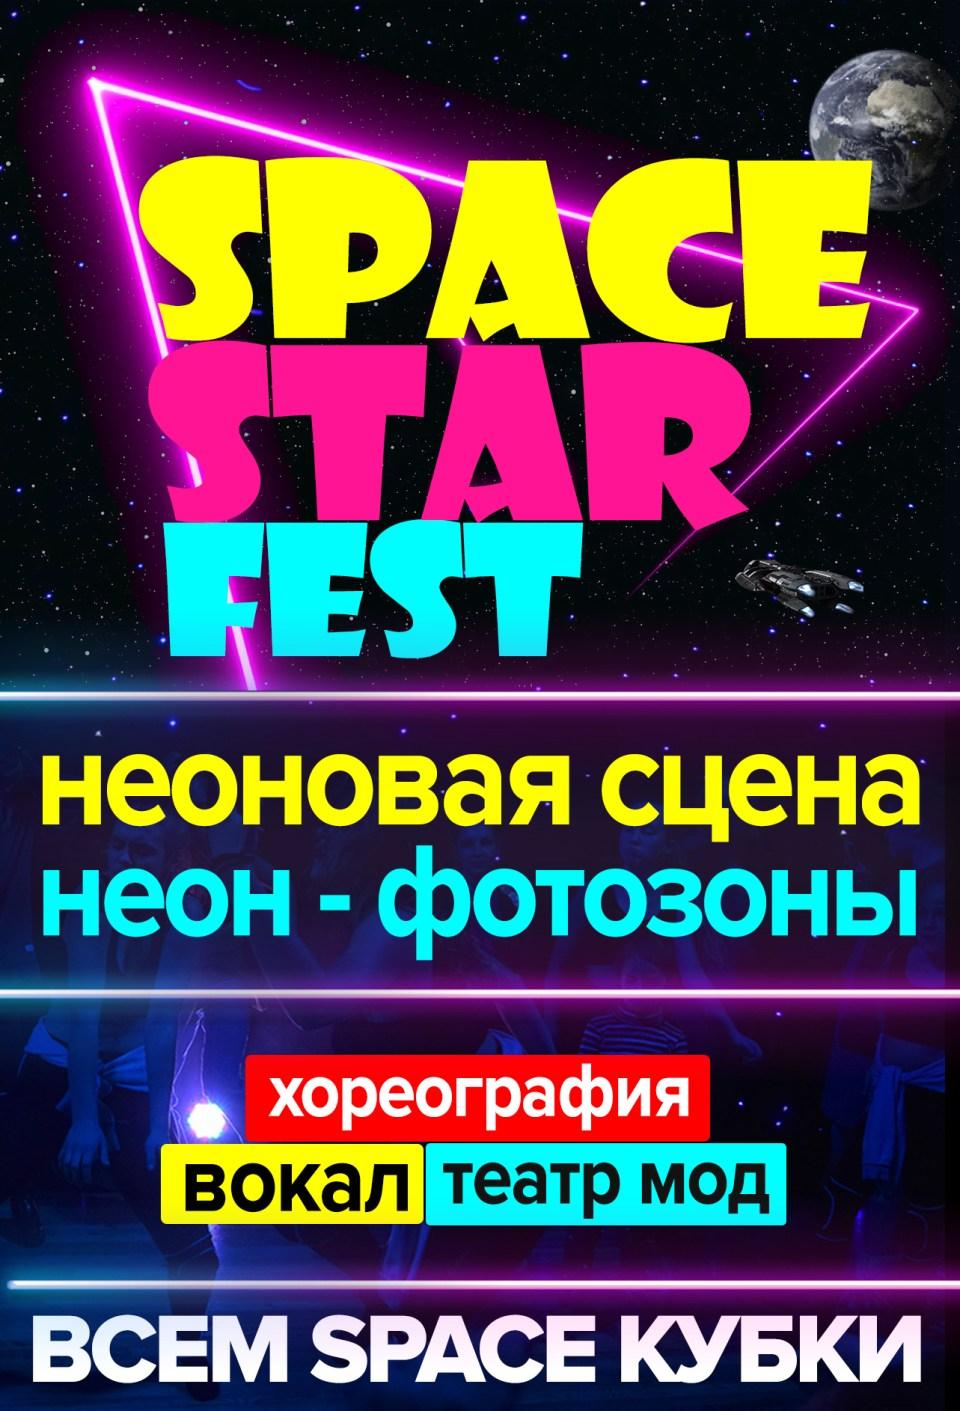 SPACE STAR FEST – Международный фестиваль-баттл талантов